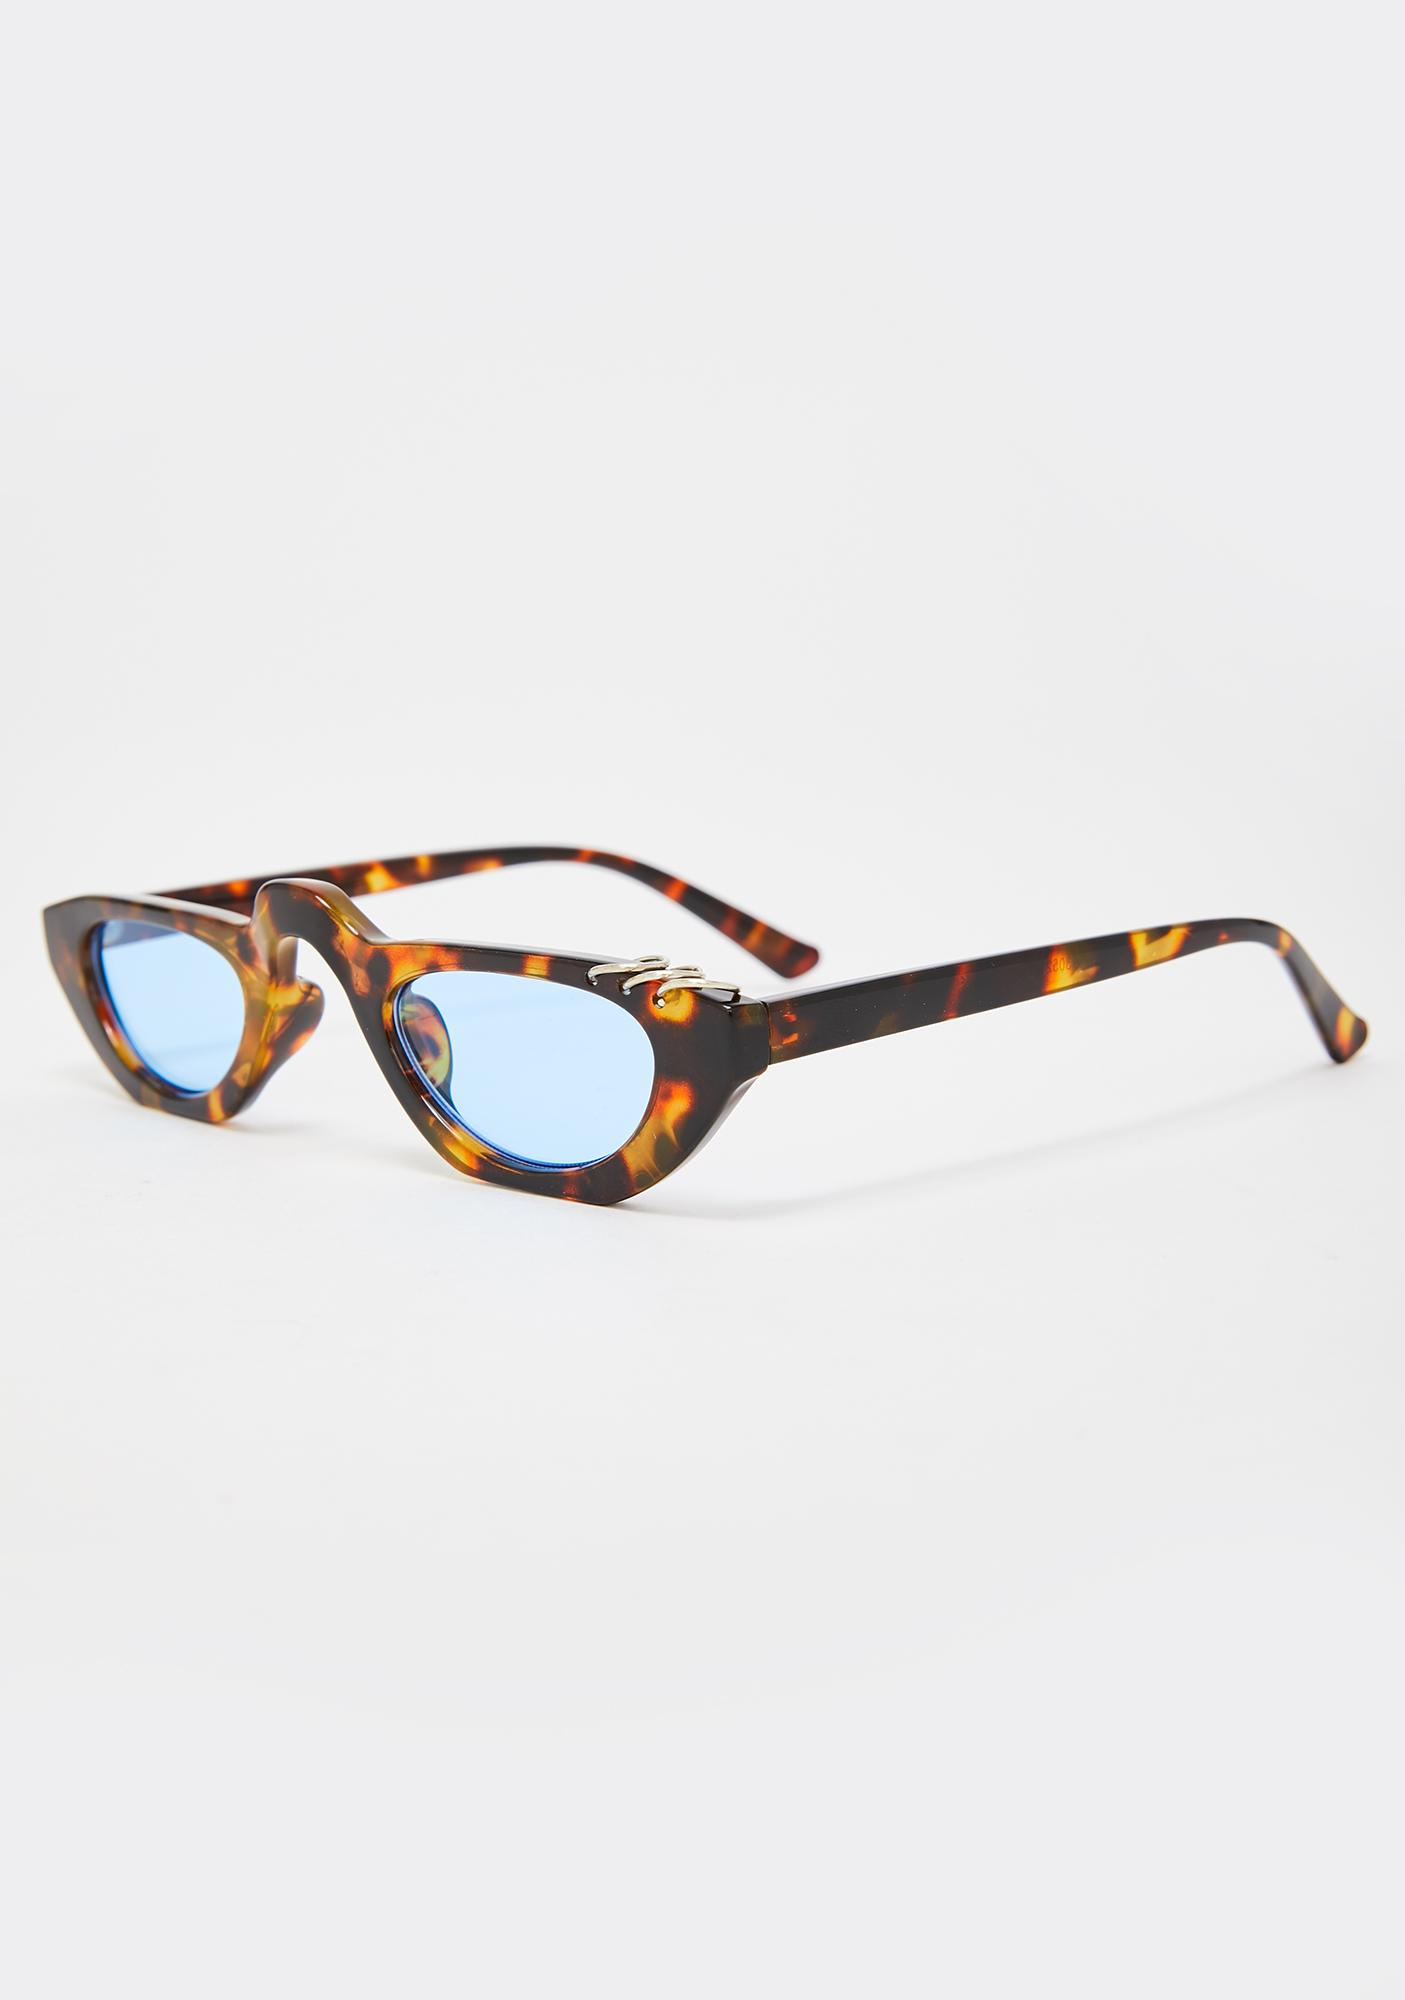 Fierce Infamous Archenemy Tiny Sunglasses